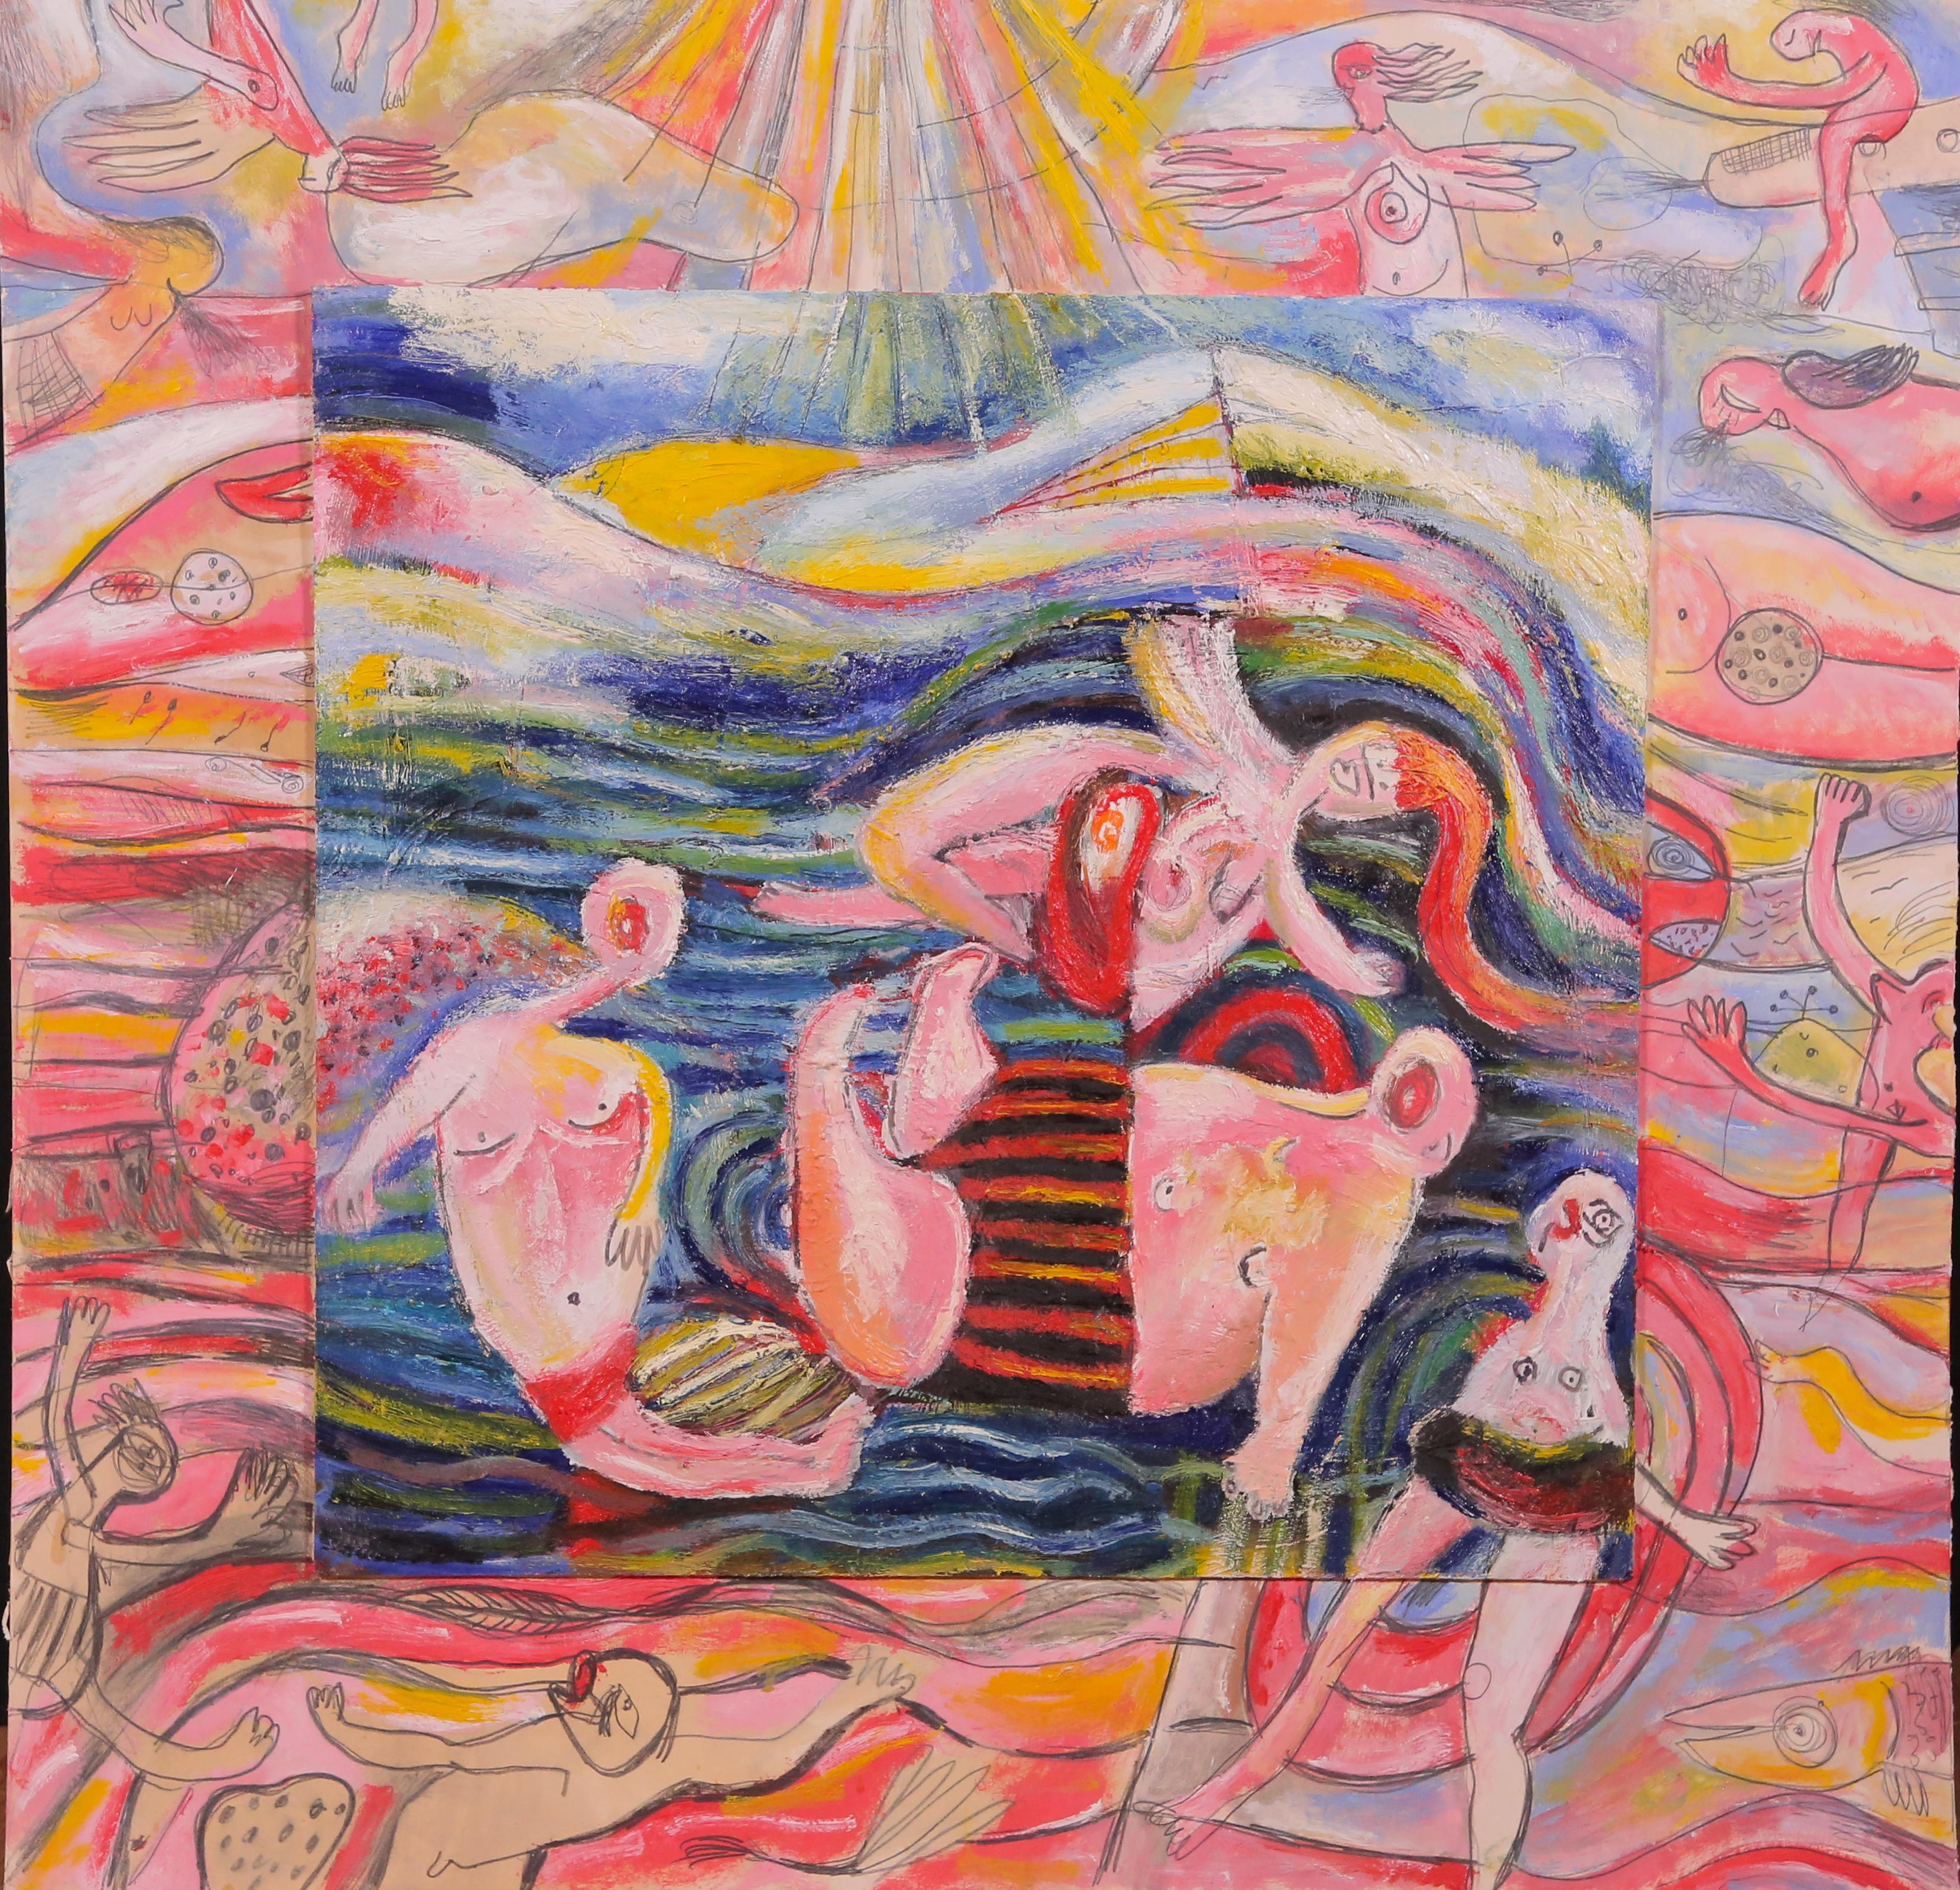 Bather, Szilard Szilagyi, Contemporary Figurative Mixed media, Landscape, Pink